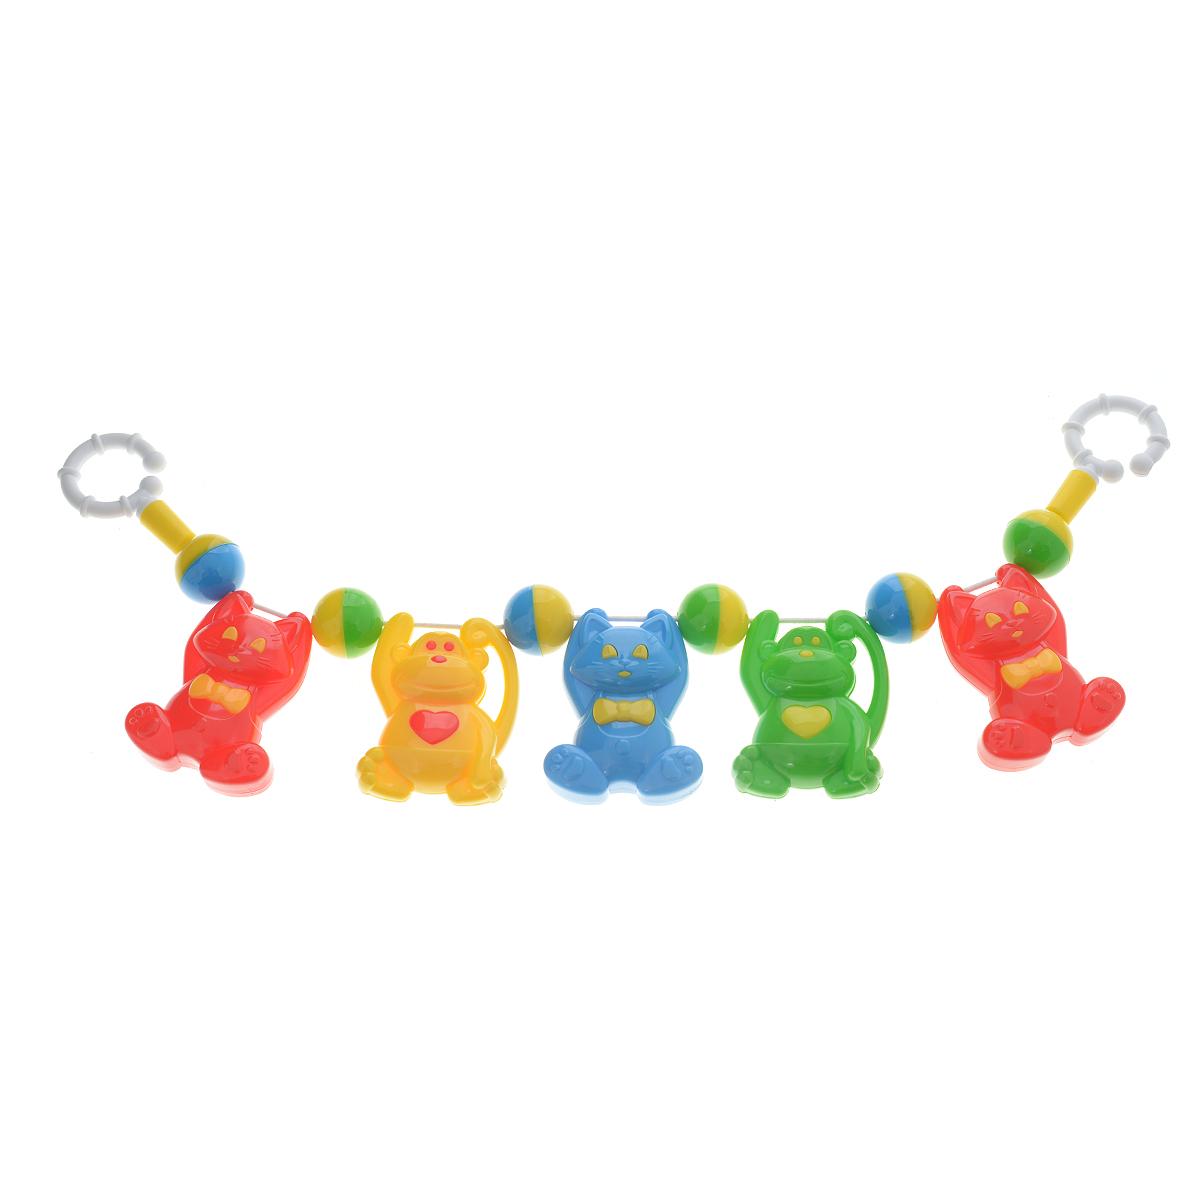 Погремушка подвеска на коляску Stellar-котята/обезьянки стеллар погремушка дудочка стеллар